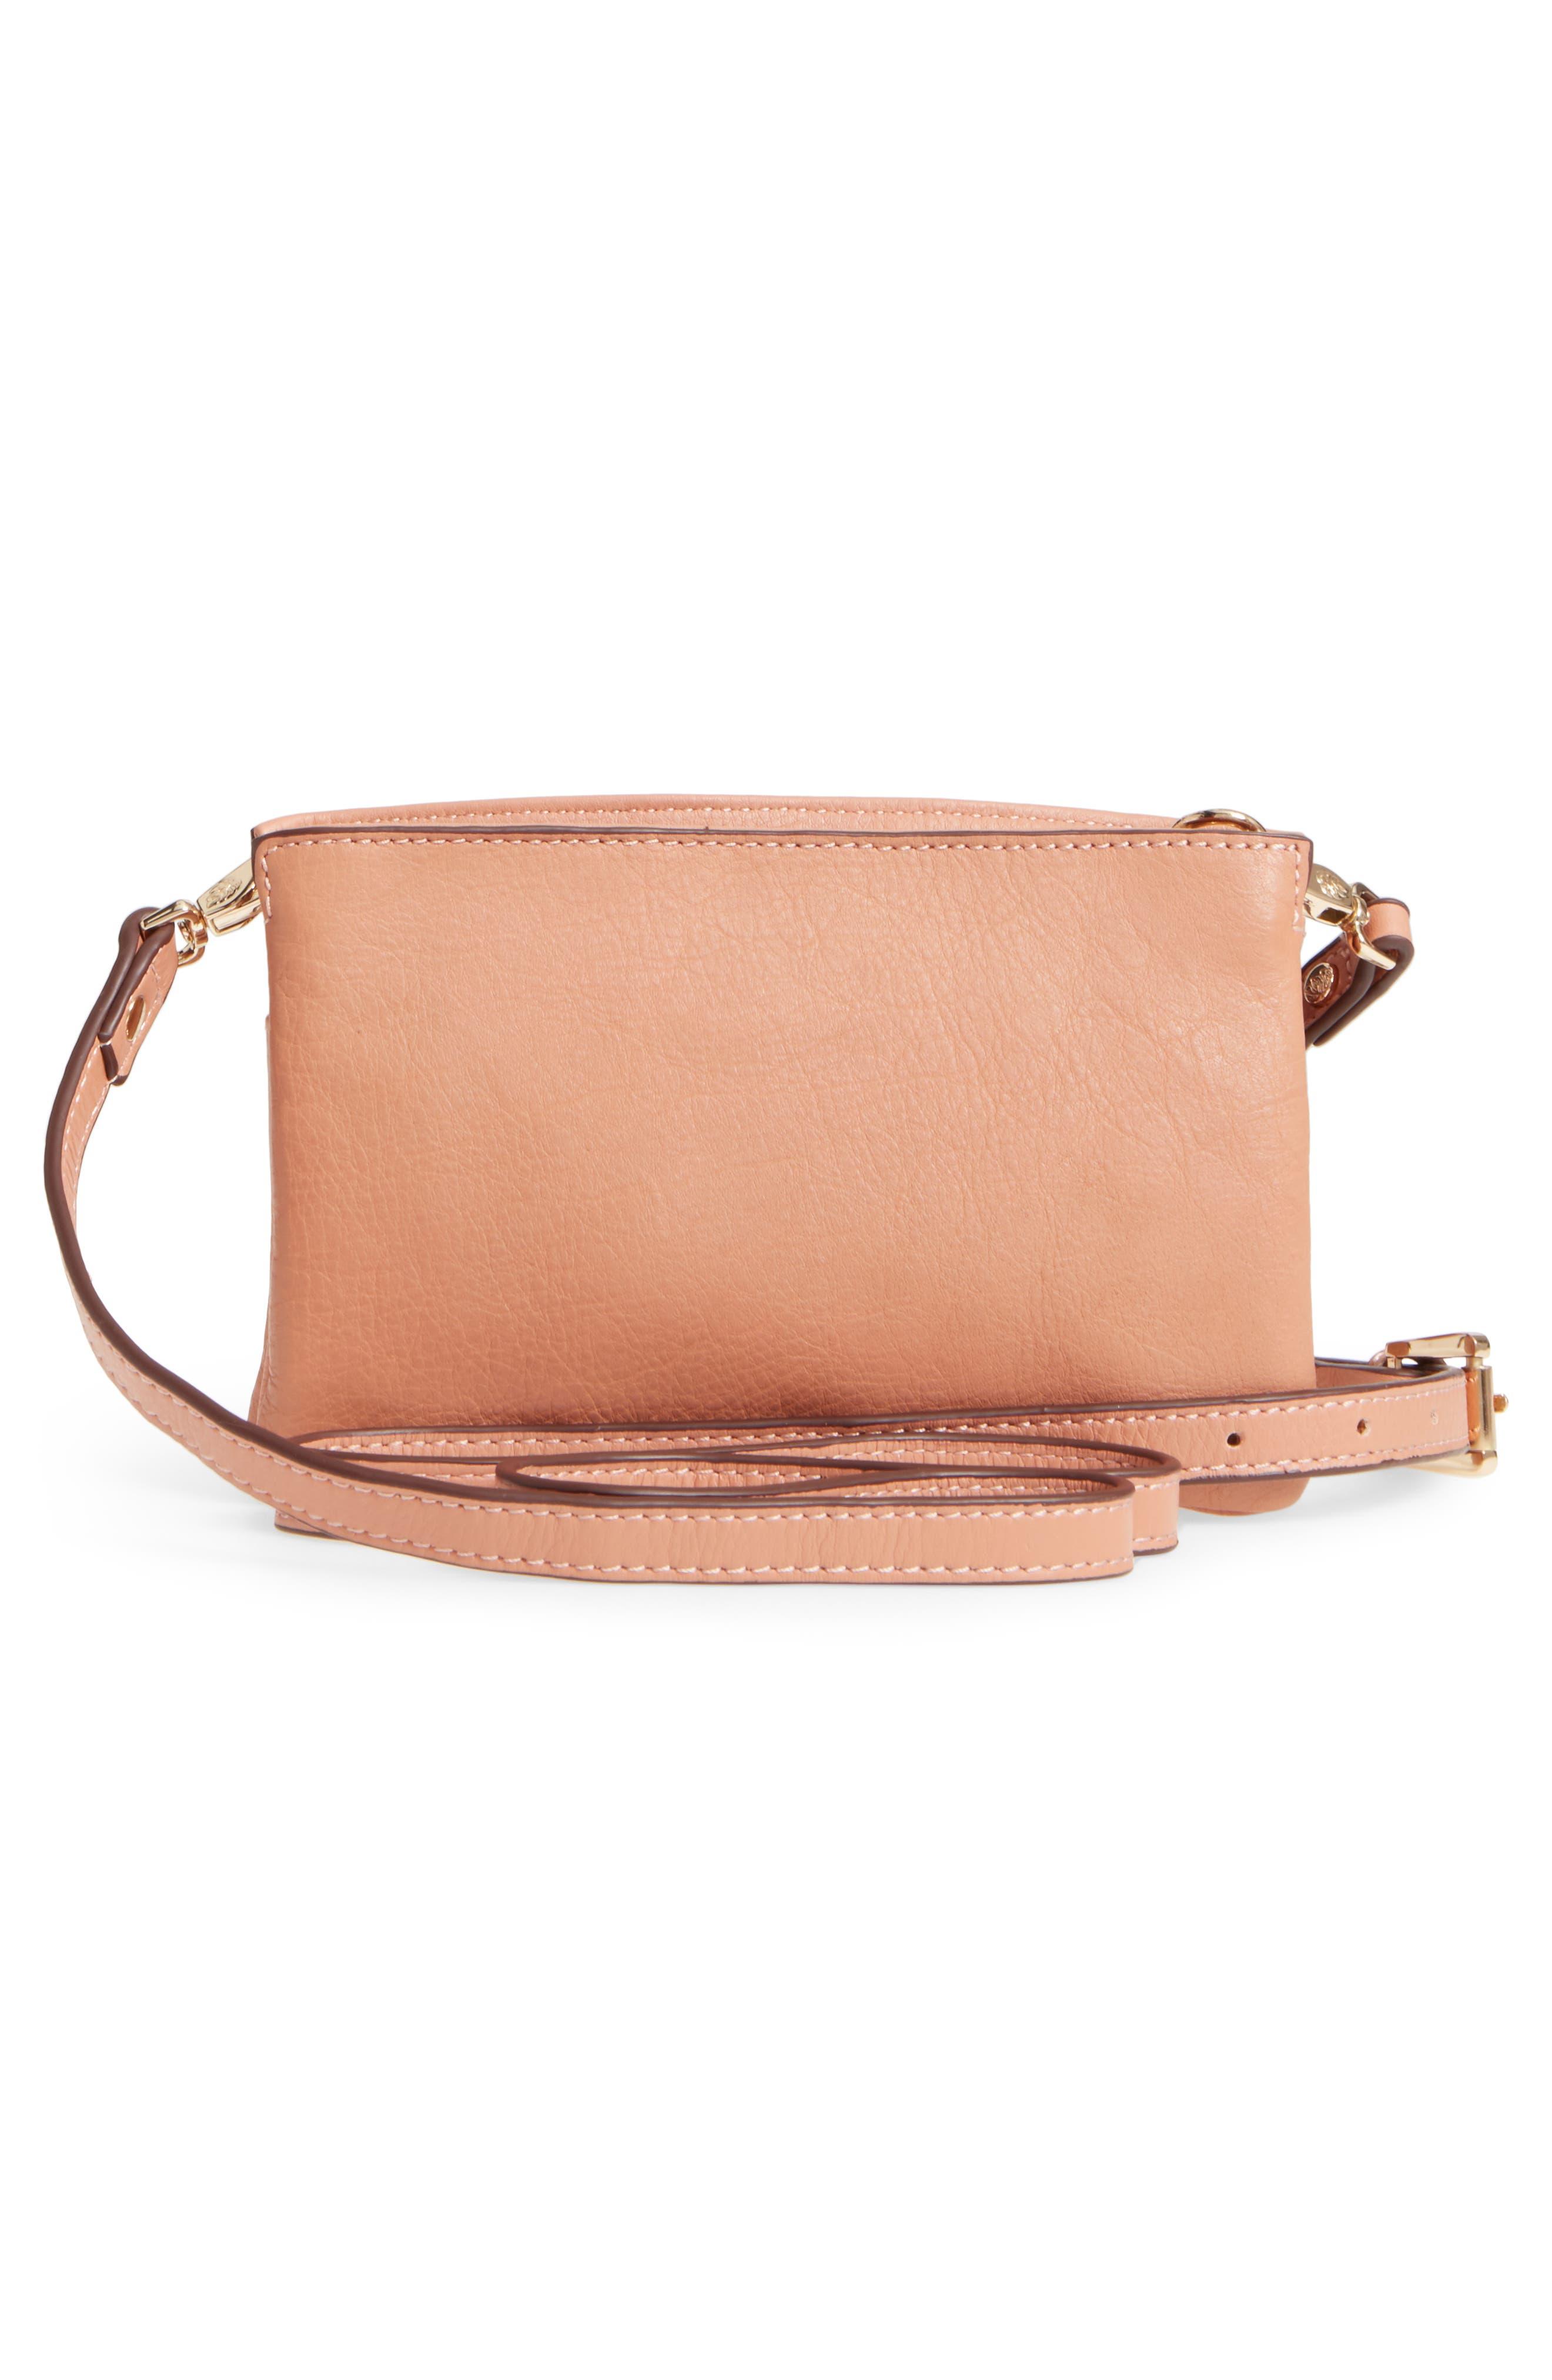 Katerini Leather Crossbody Wallet,                             Alternate thumbnail 3, color,                             650